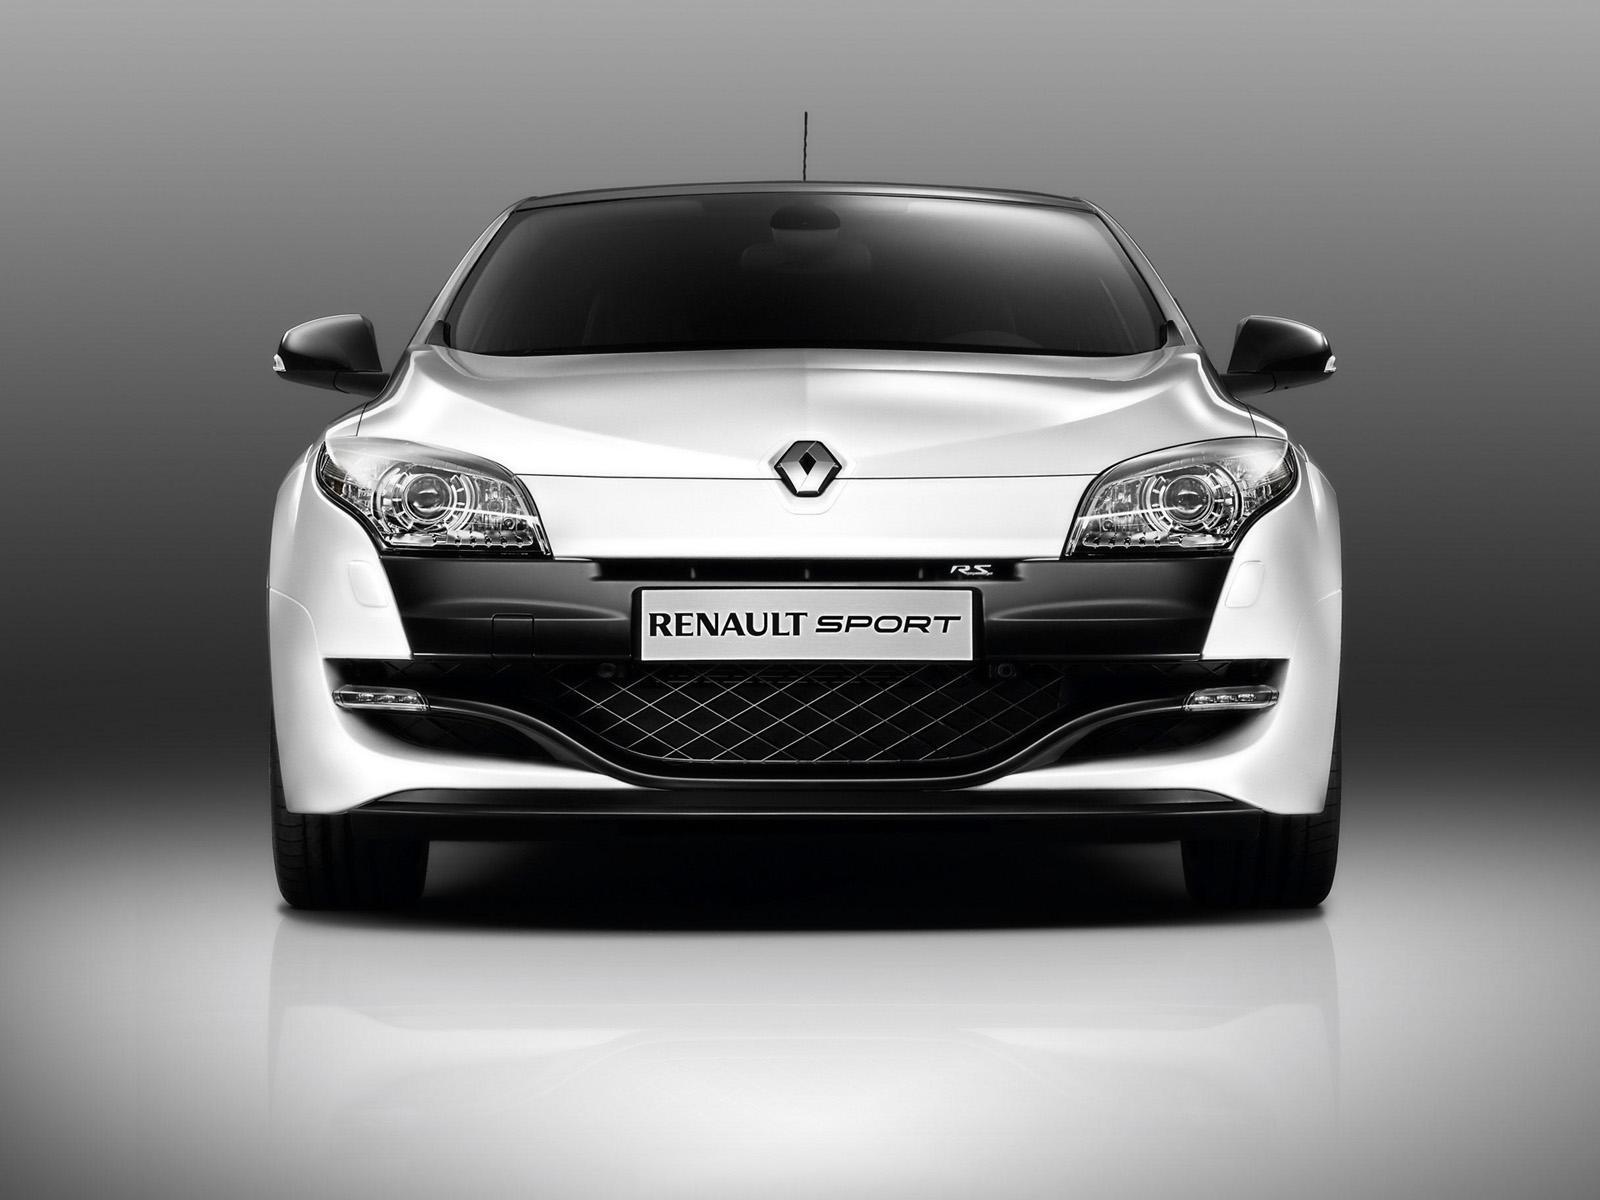 2010 Renault Mégane RS